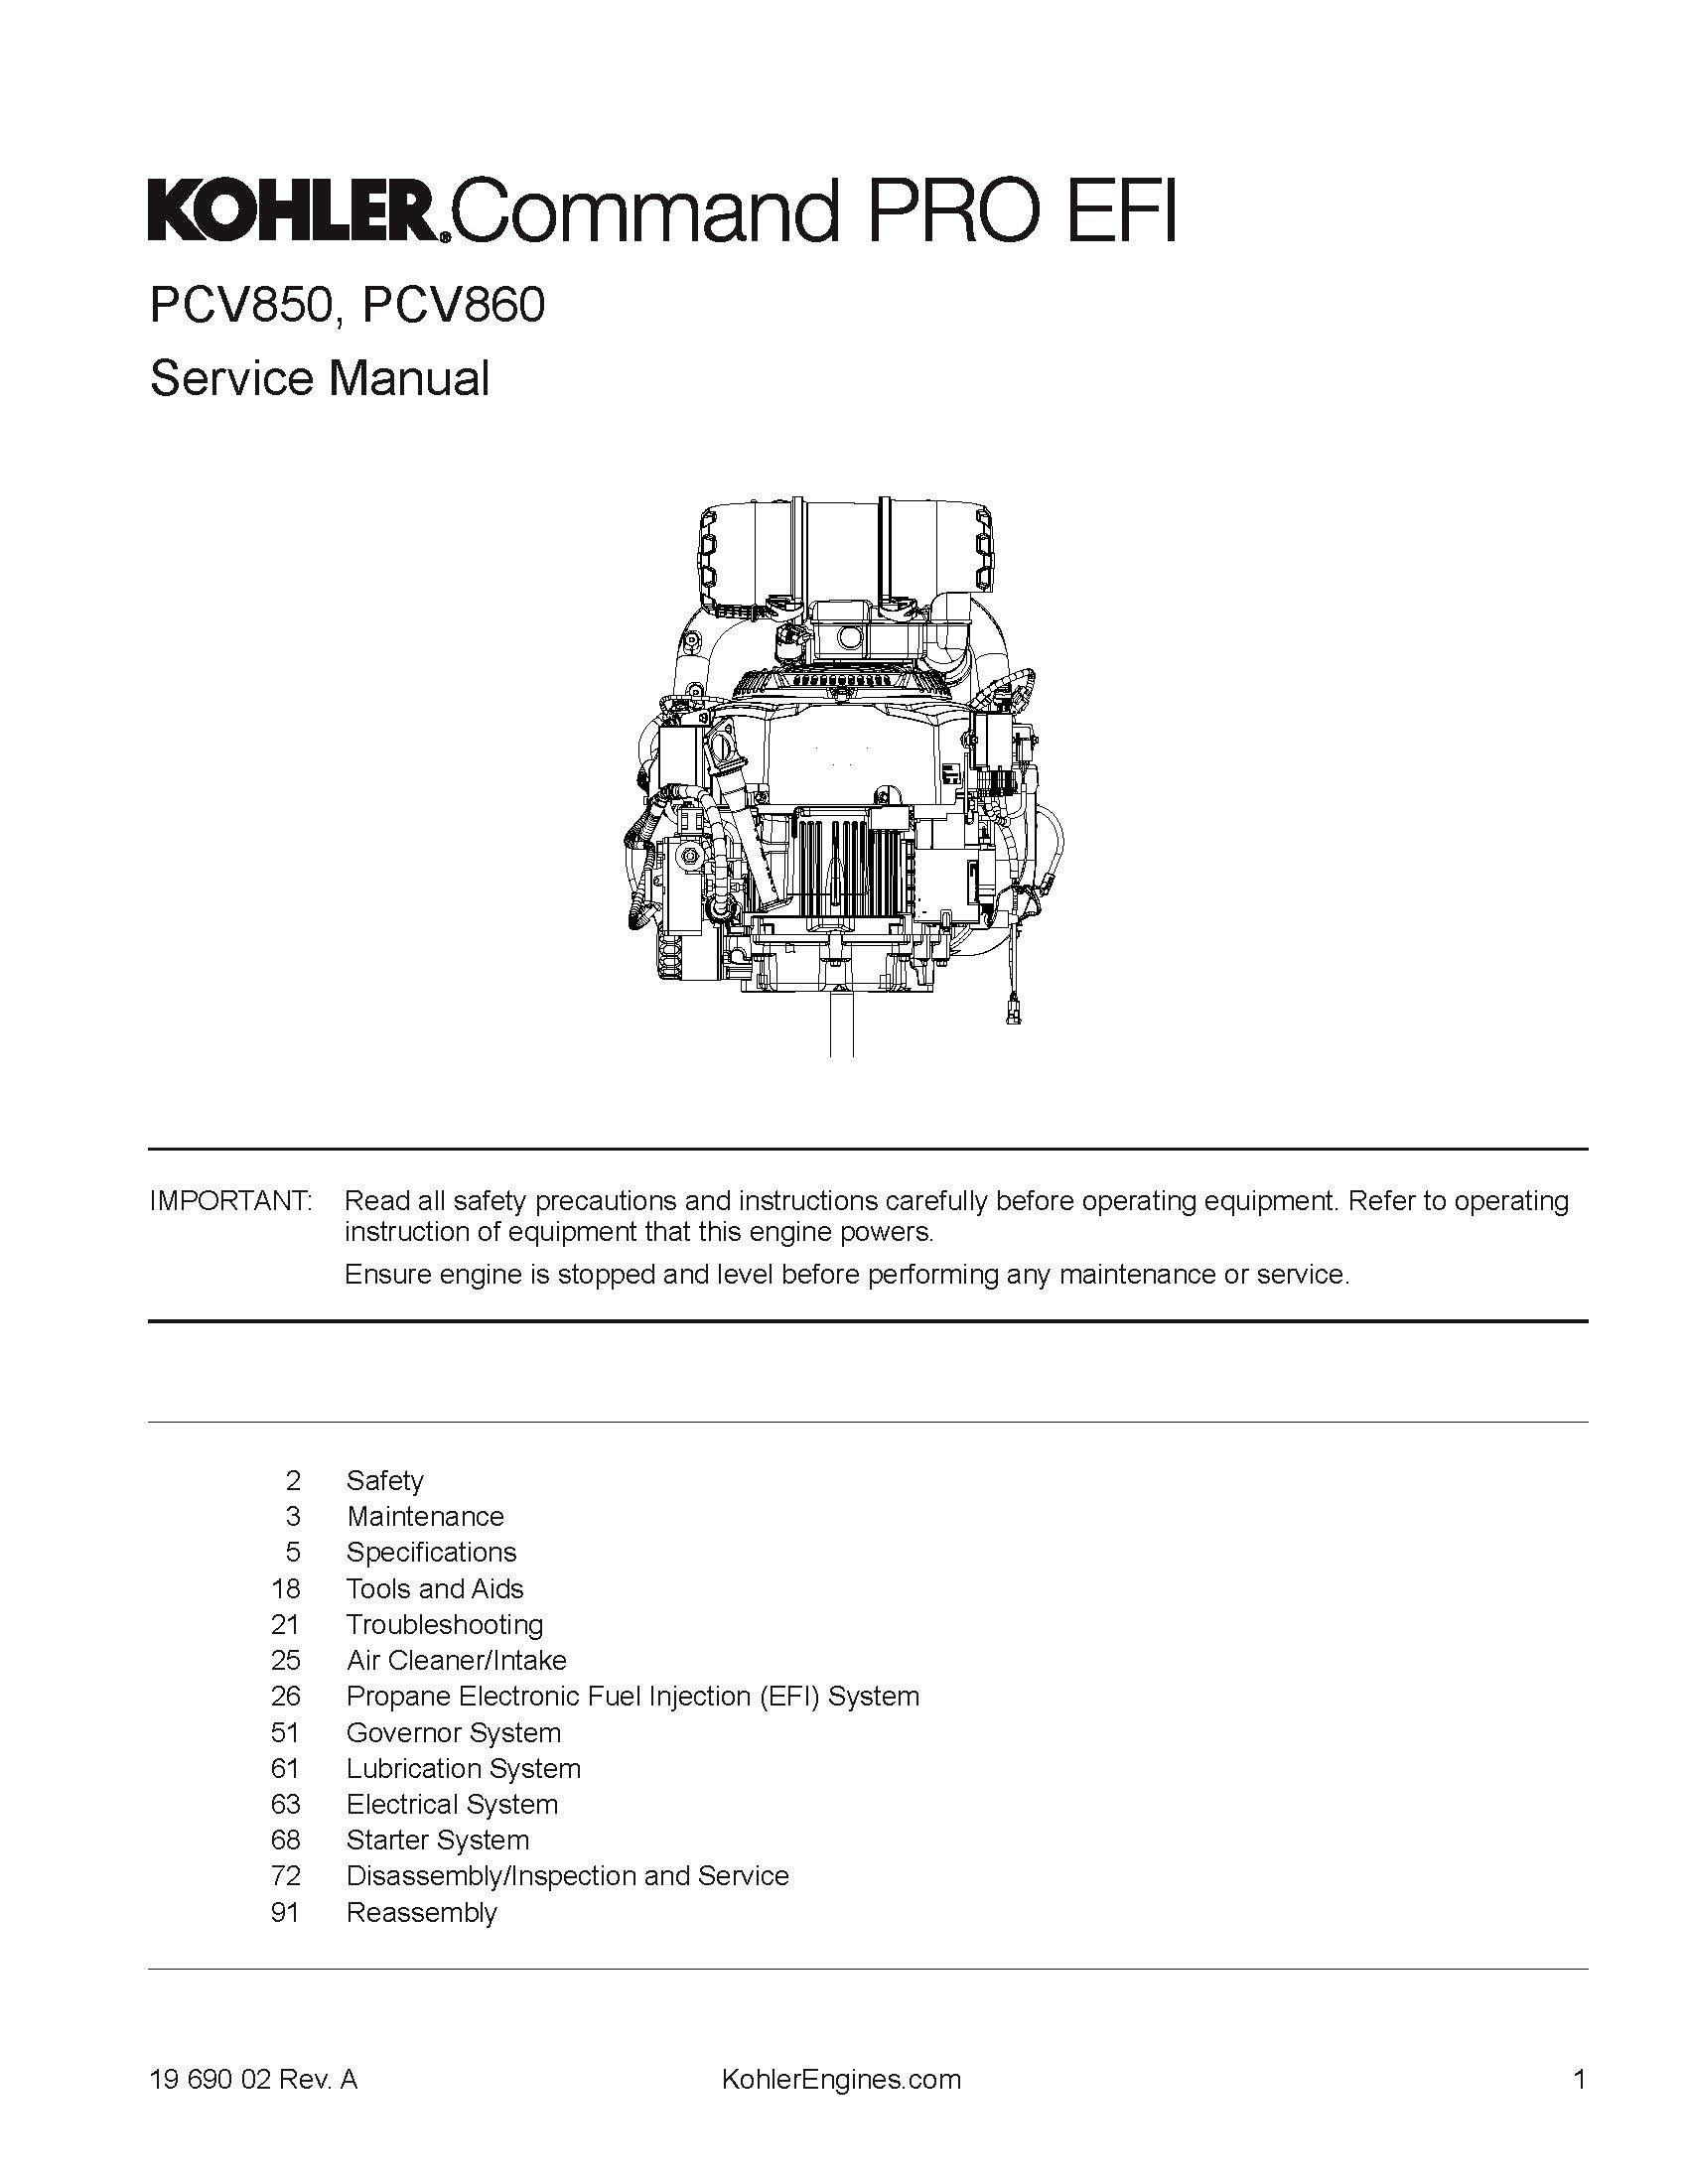 Kohler COMMAND PRO EFI PCV850, PCV860 Propane Engine Service Manual 19 690 02 Revision A [Black and White Loose Leaf] ebook